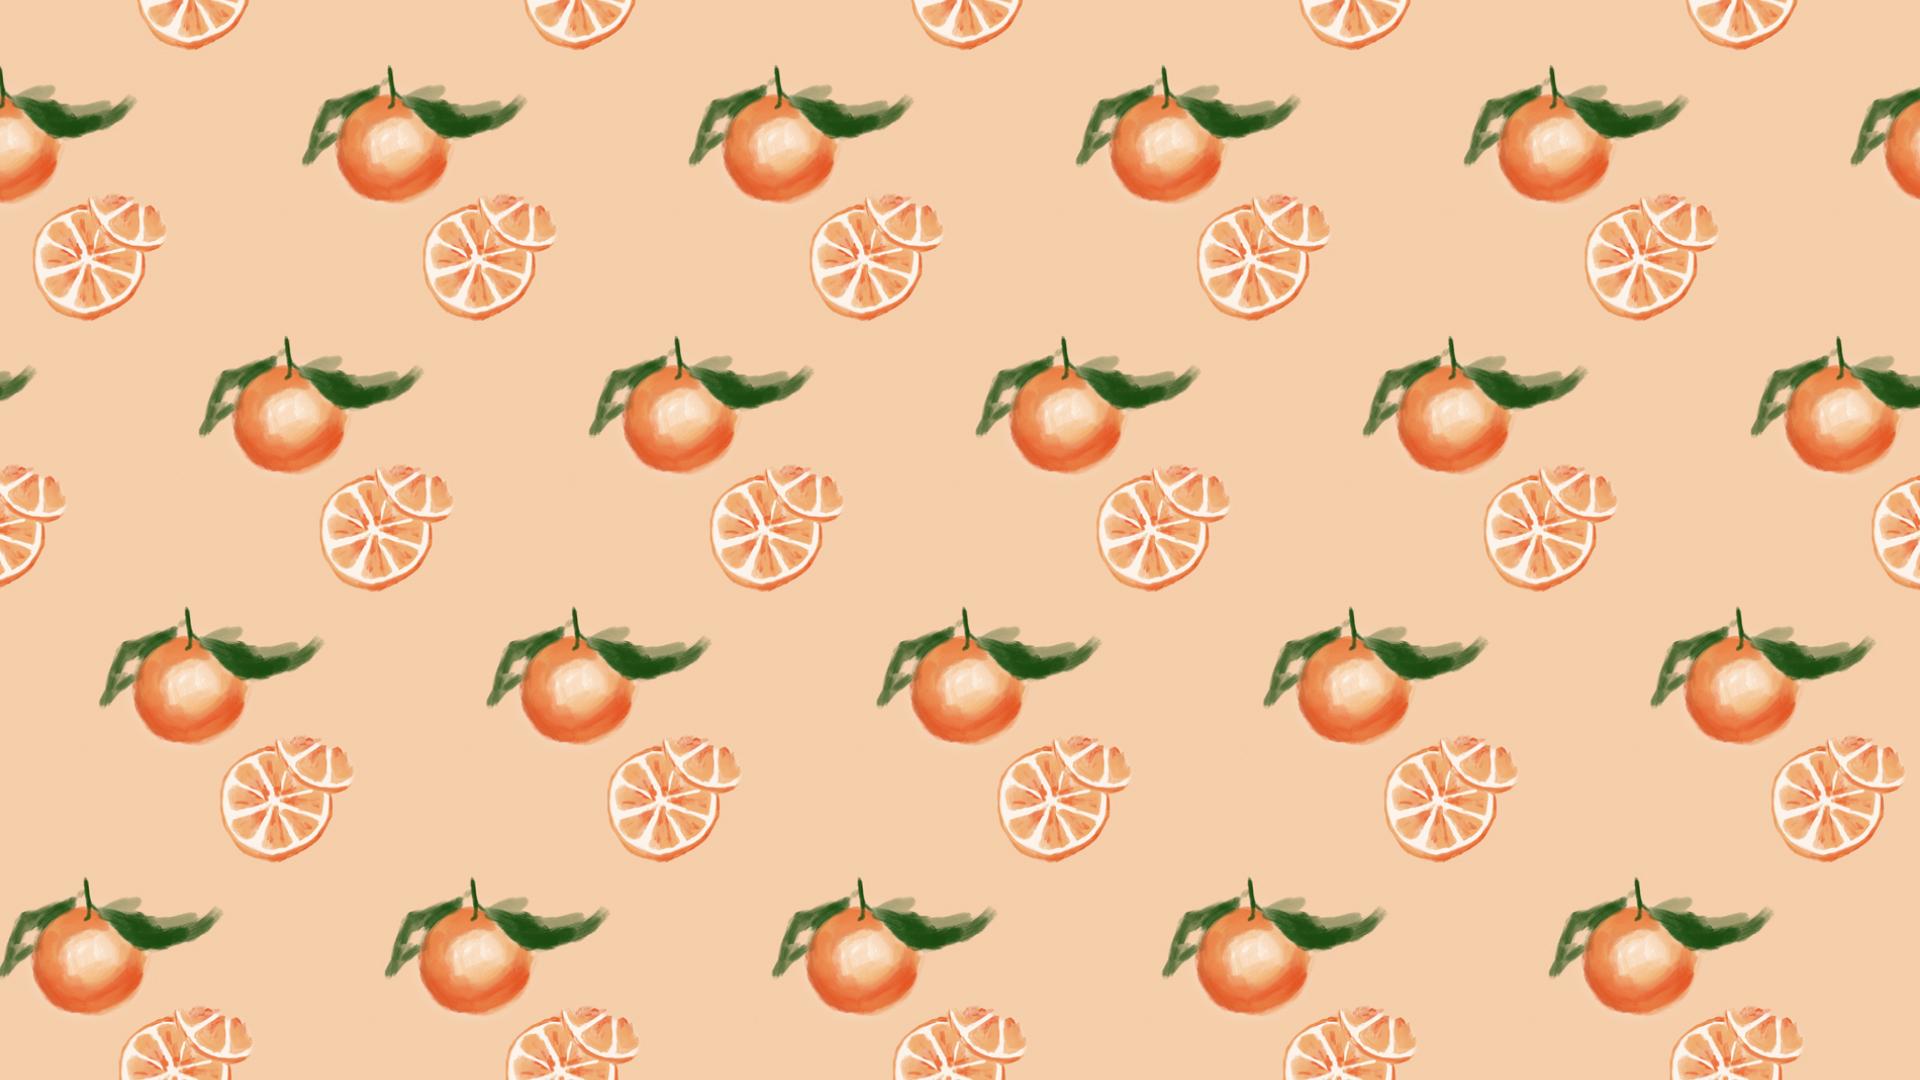 Wellness Brand Design - Orange pattern with original illustrations